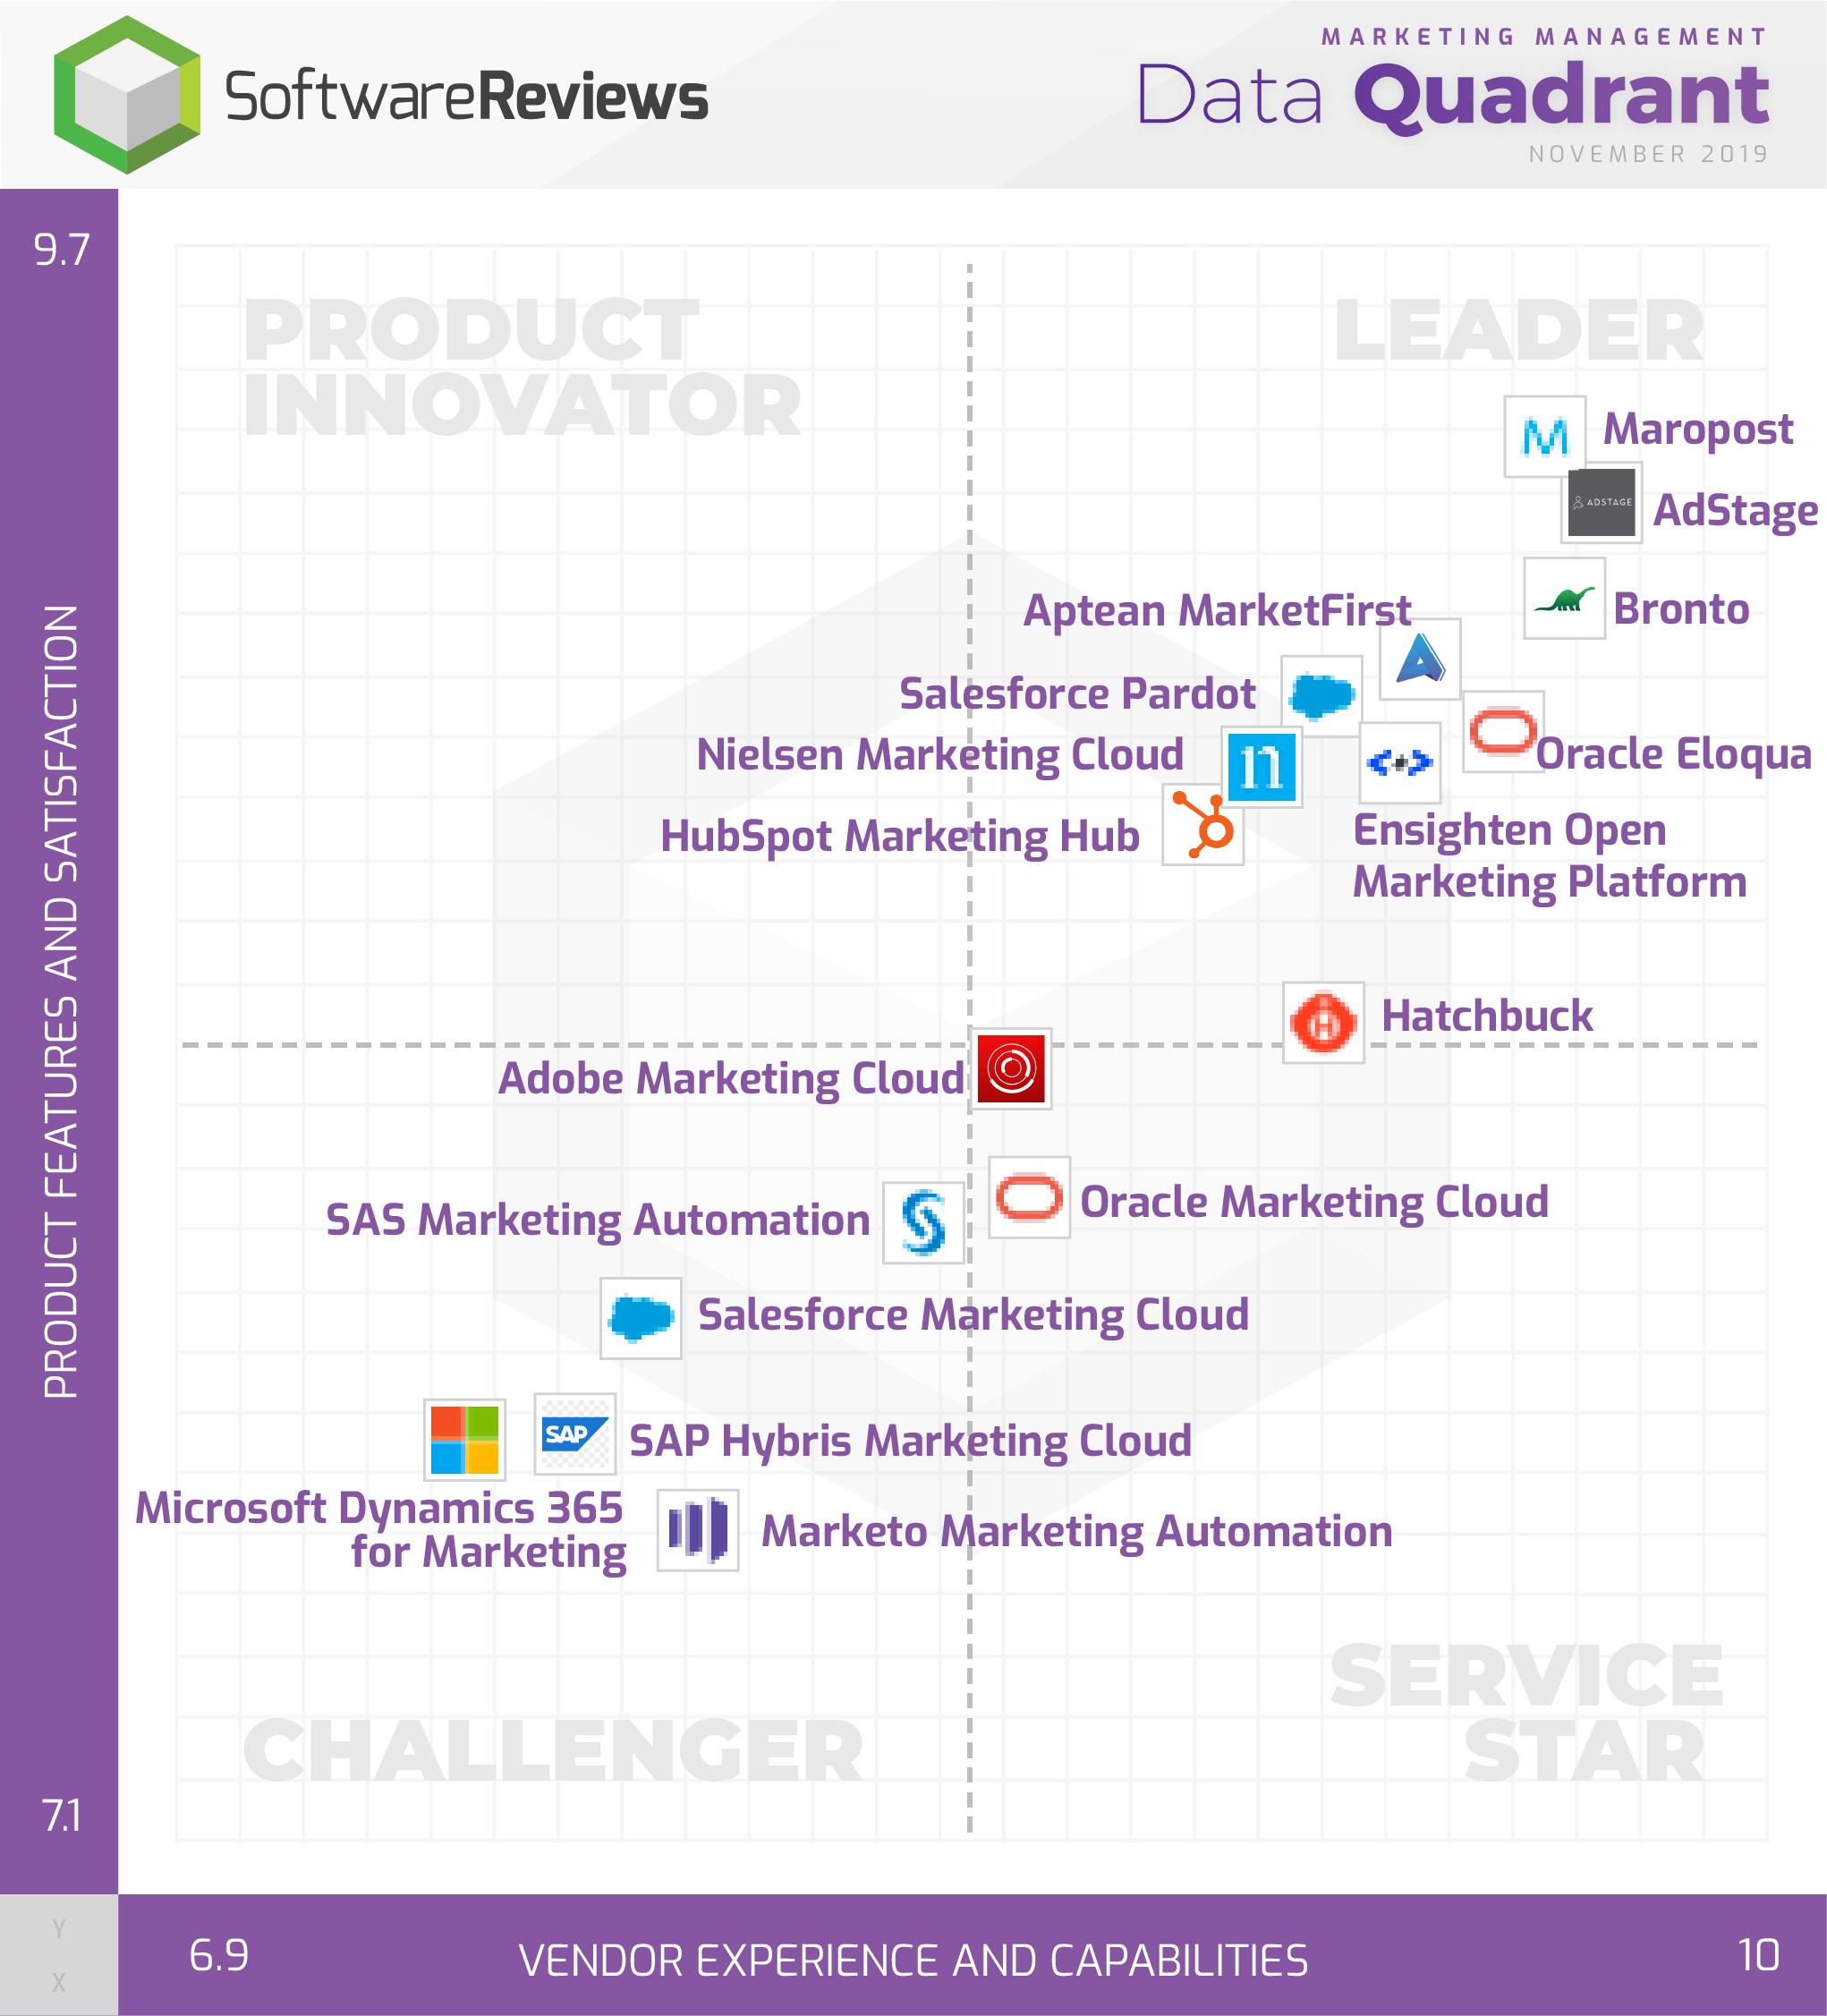 Marketing Management Data Quadrant